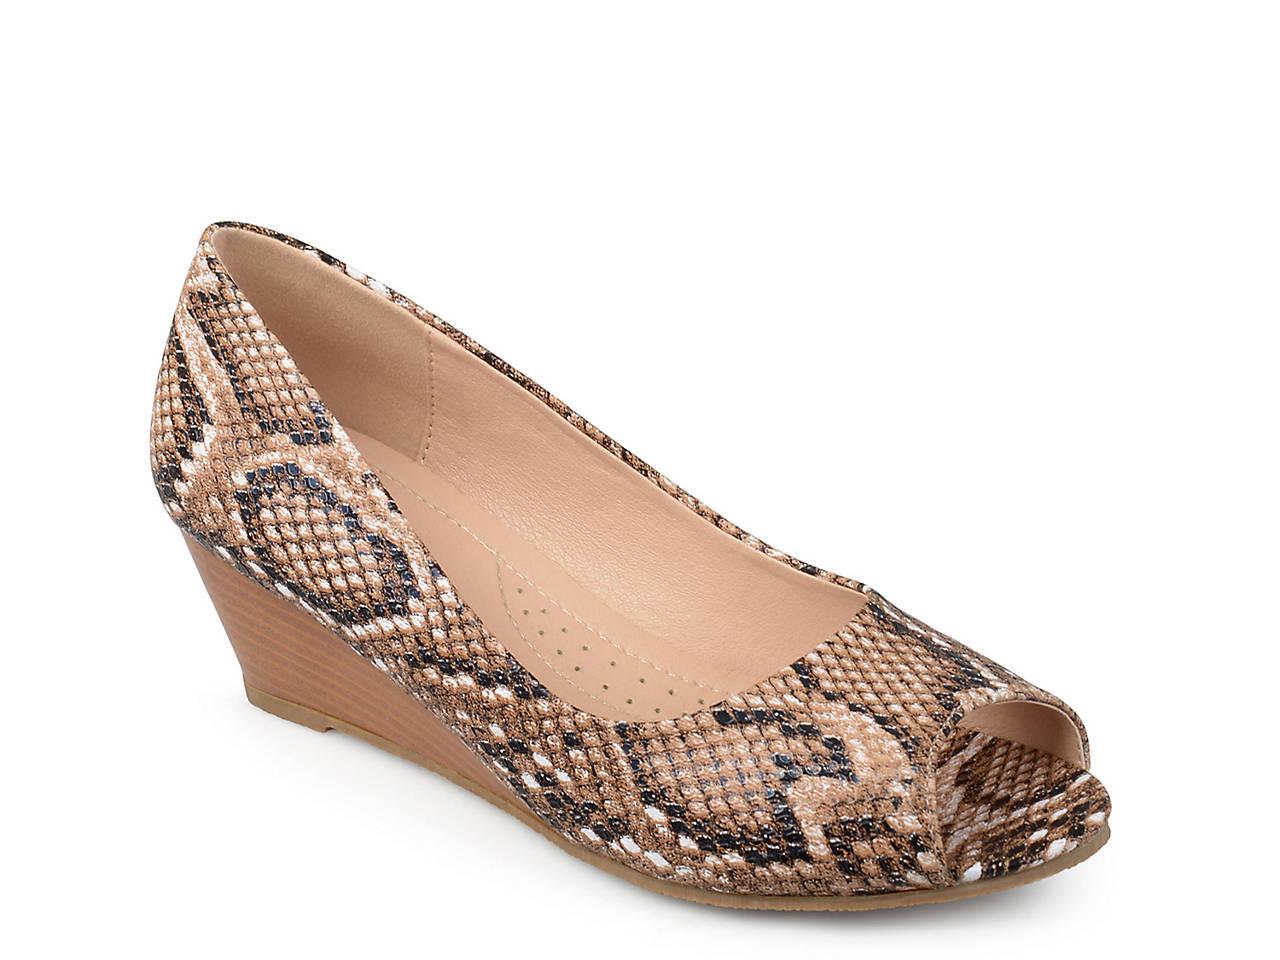 945e5a79d48 Journee Collection Chaz Wedge Pump Women s Shoes